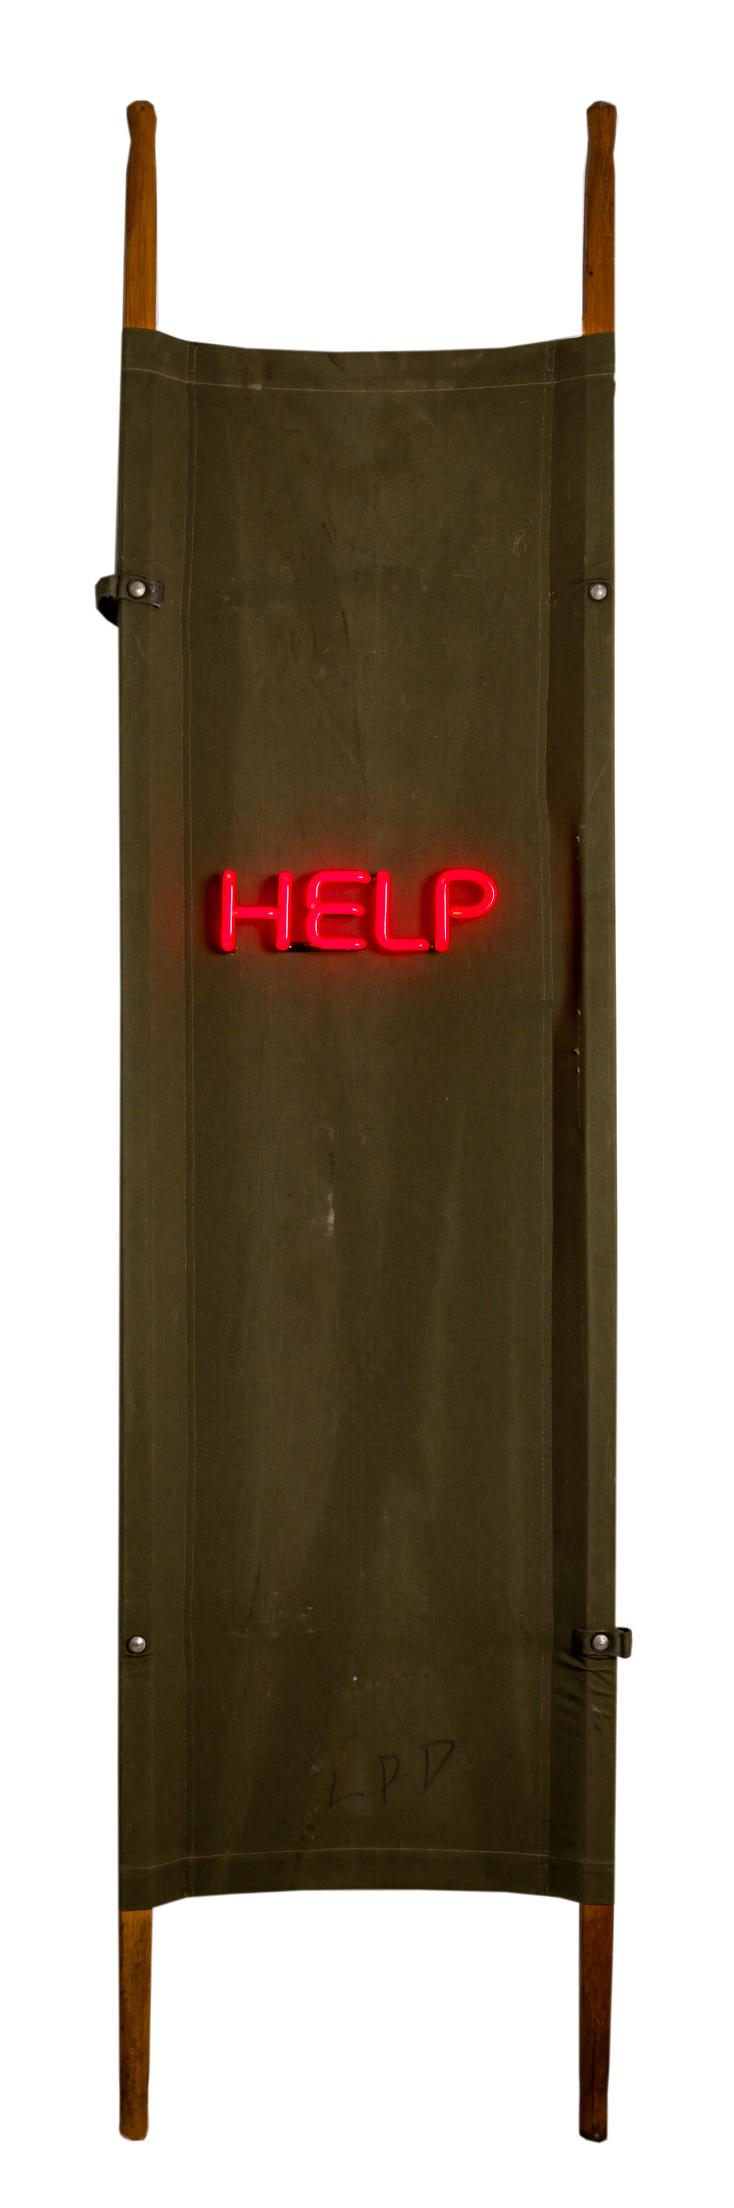 HELP, 2016, Neon on Stretcher, 89.5 x 22.5 x 7.75 in.